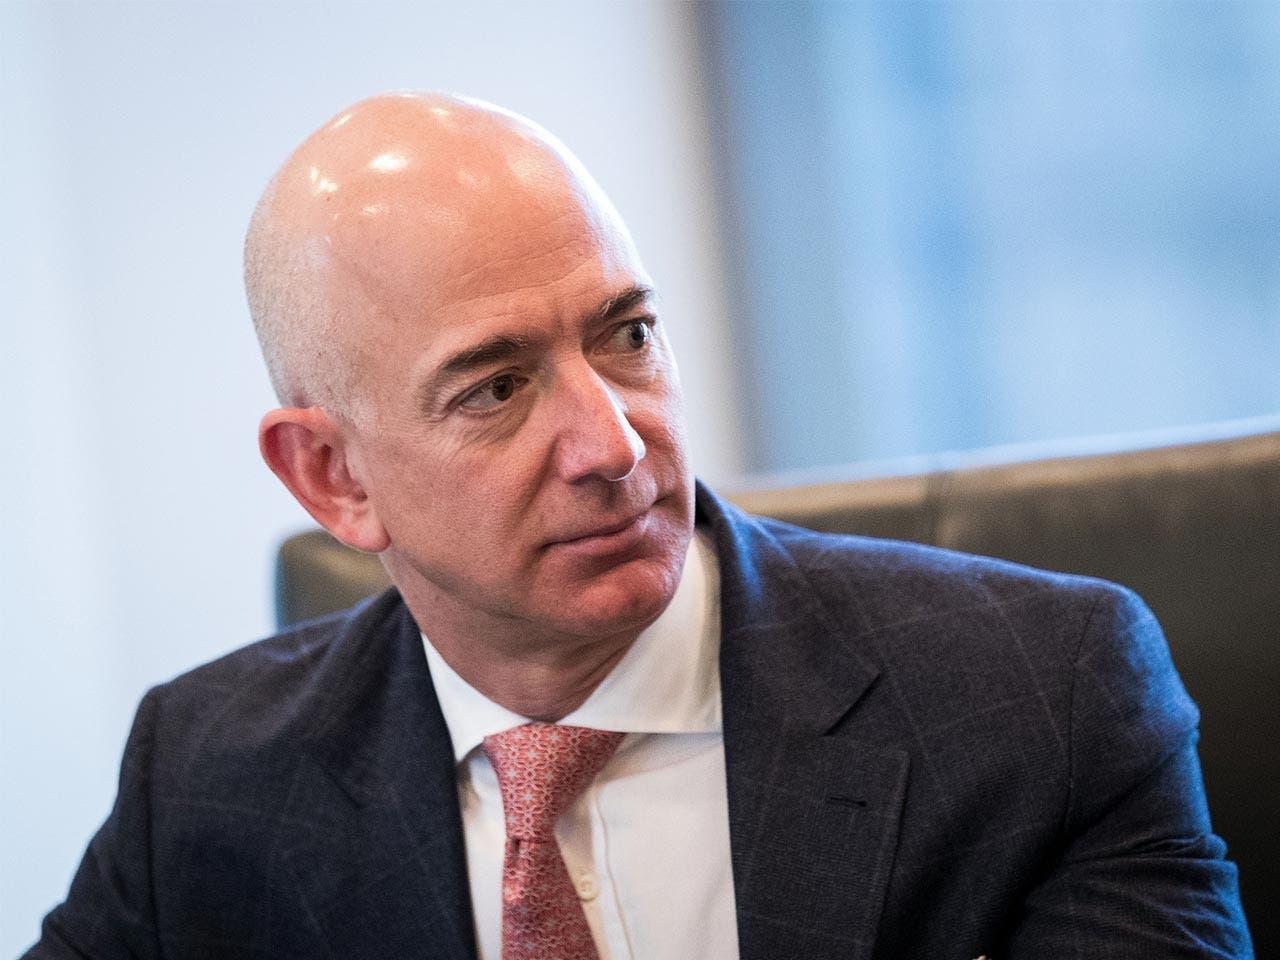 Jeff Bezos | Drew Angerer/Shutterstock.com